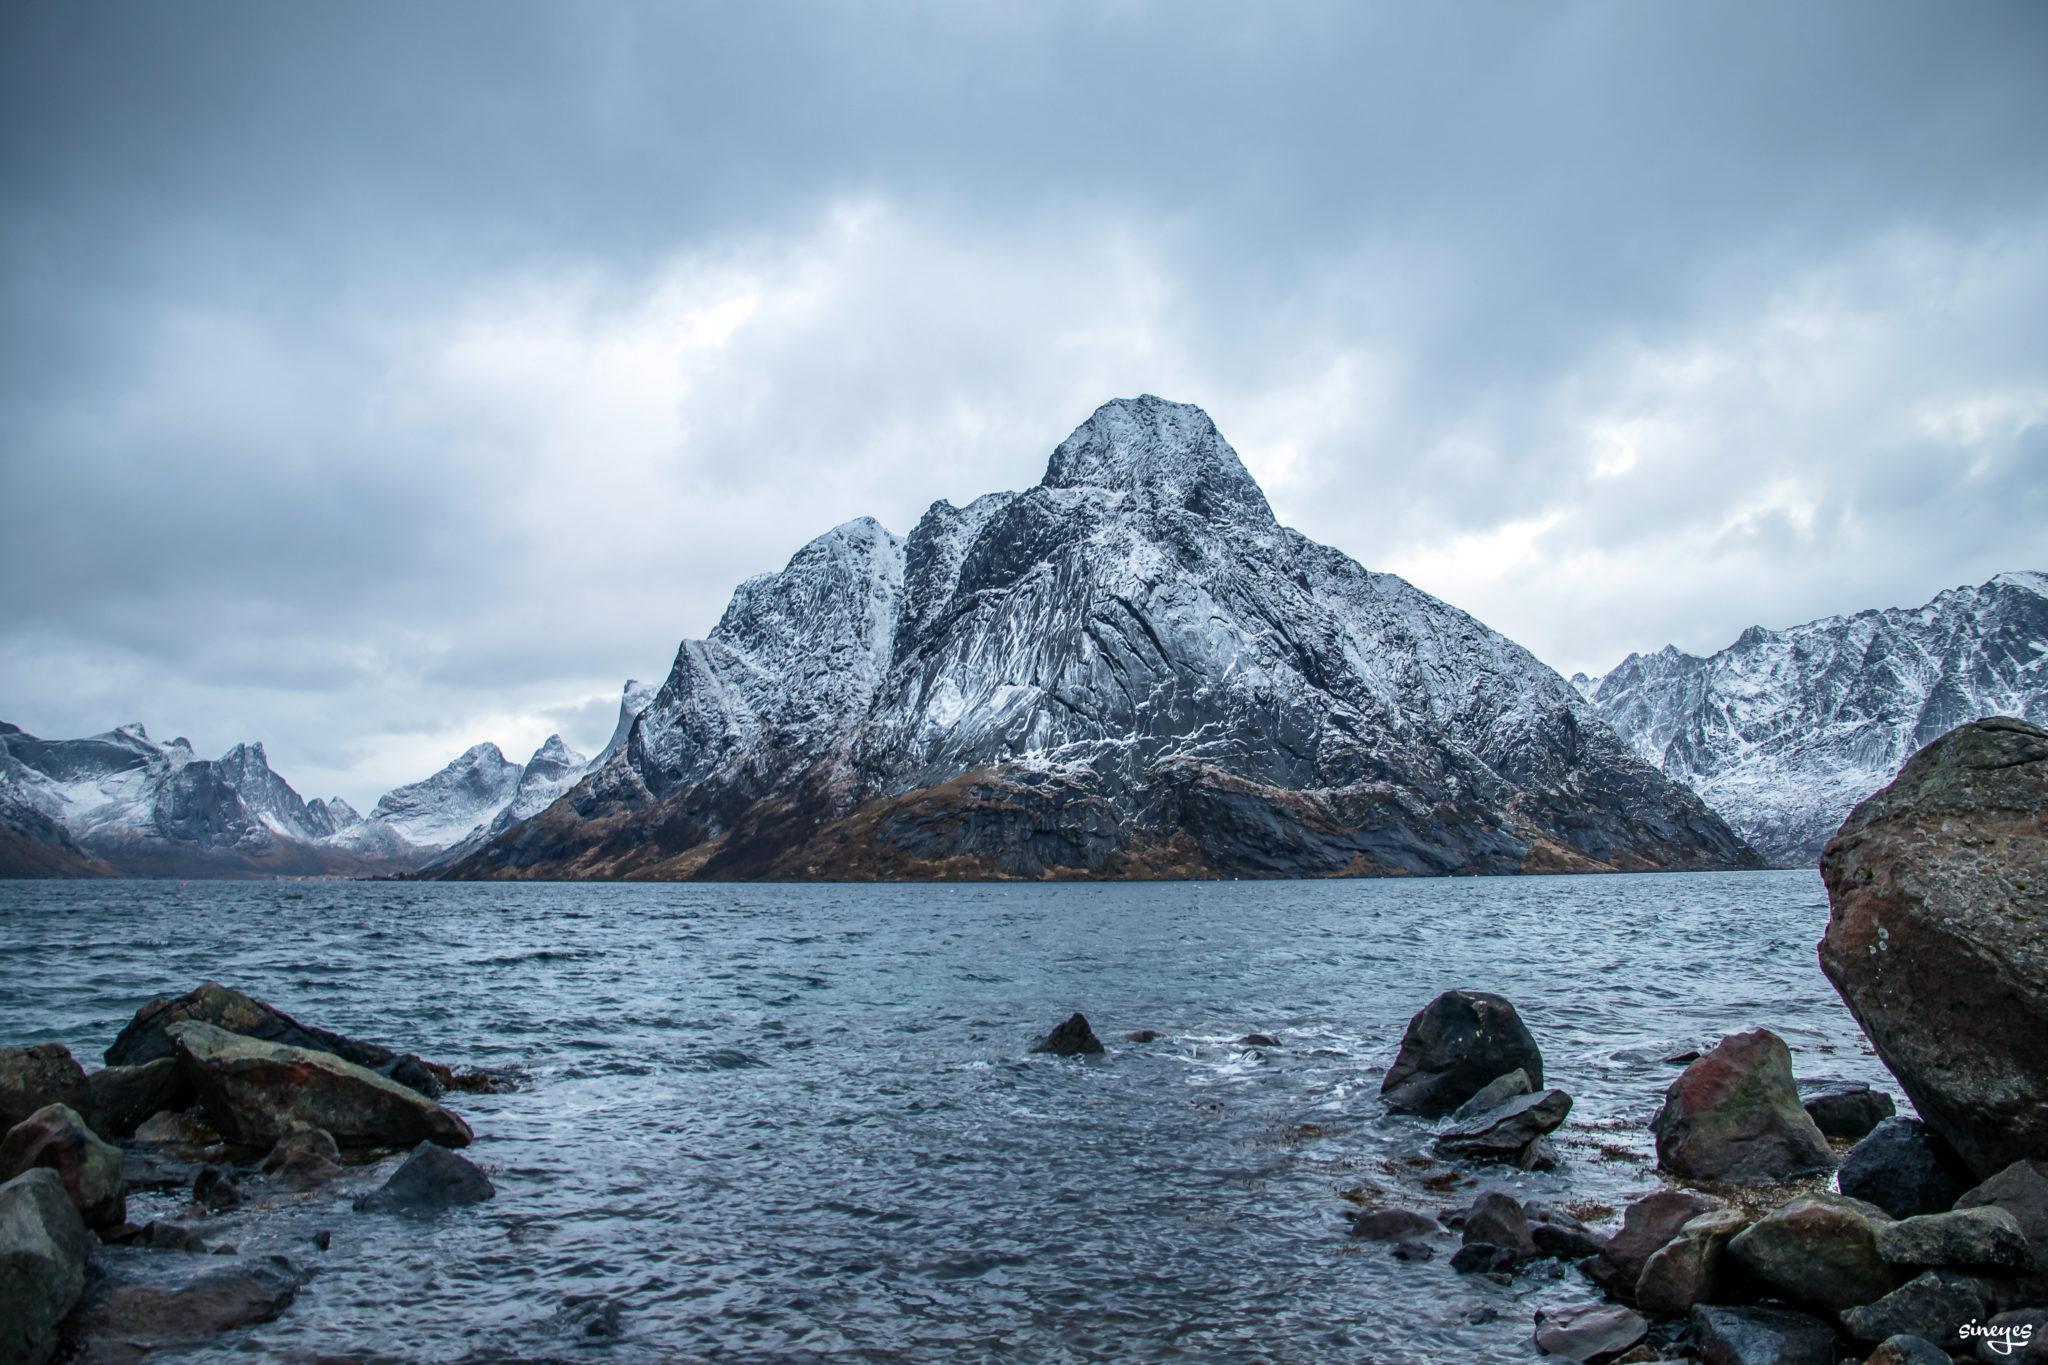 Reine - Iles Lofoten, Norvège